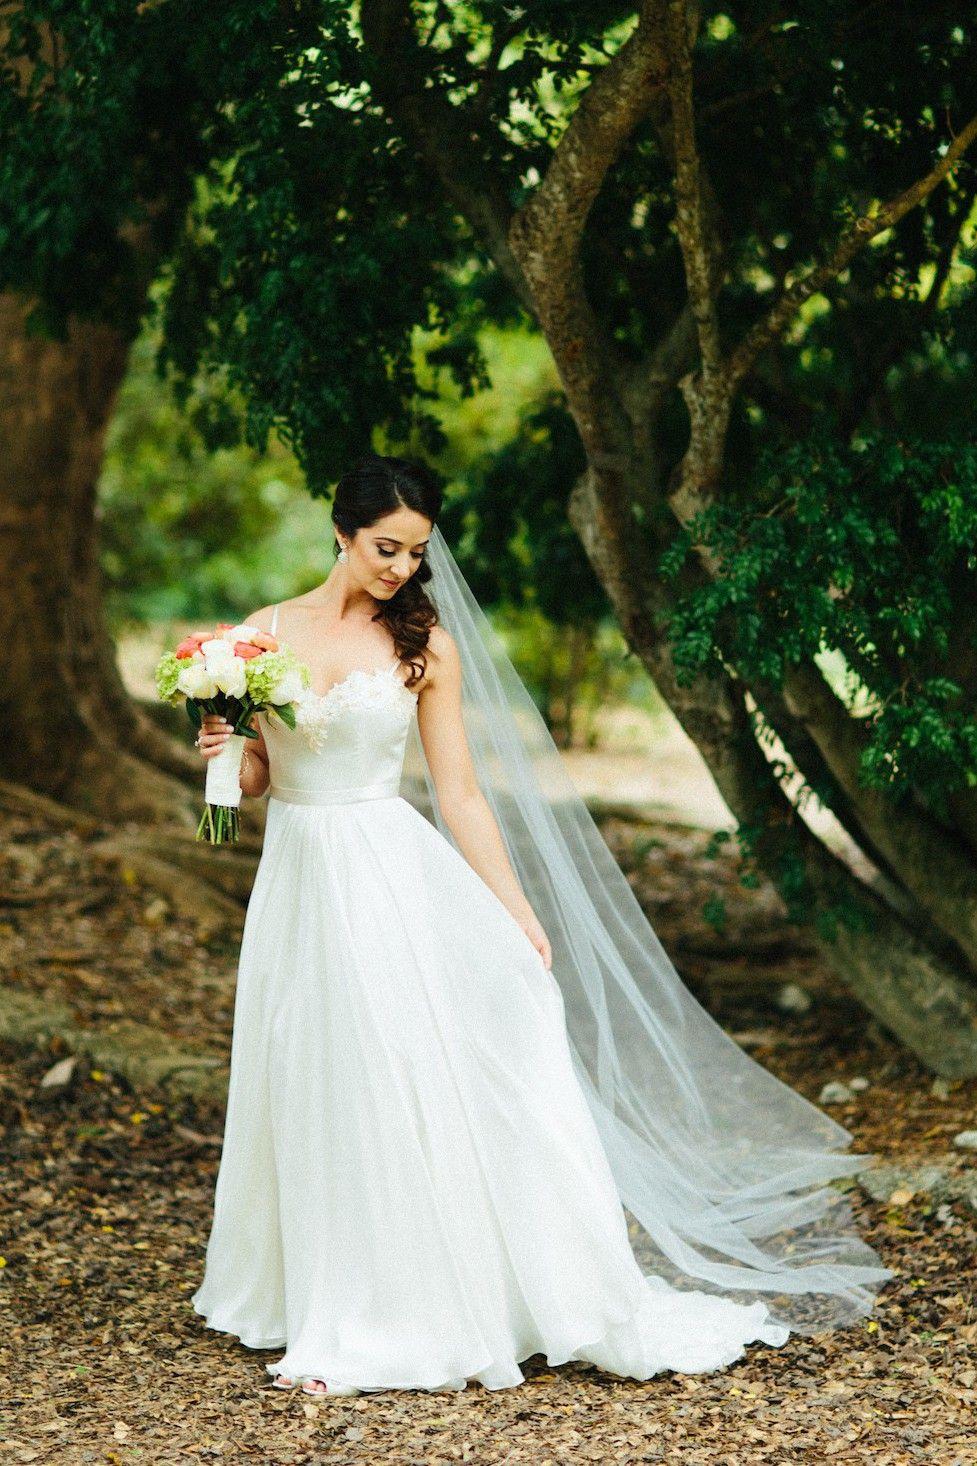 Catherine deane size 0 wedding dress catherine deane catherine catherine deane size 0 wedding dress ombrellifo Image collections